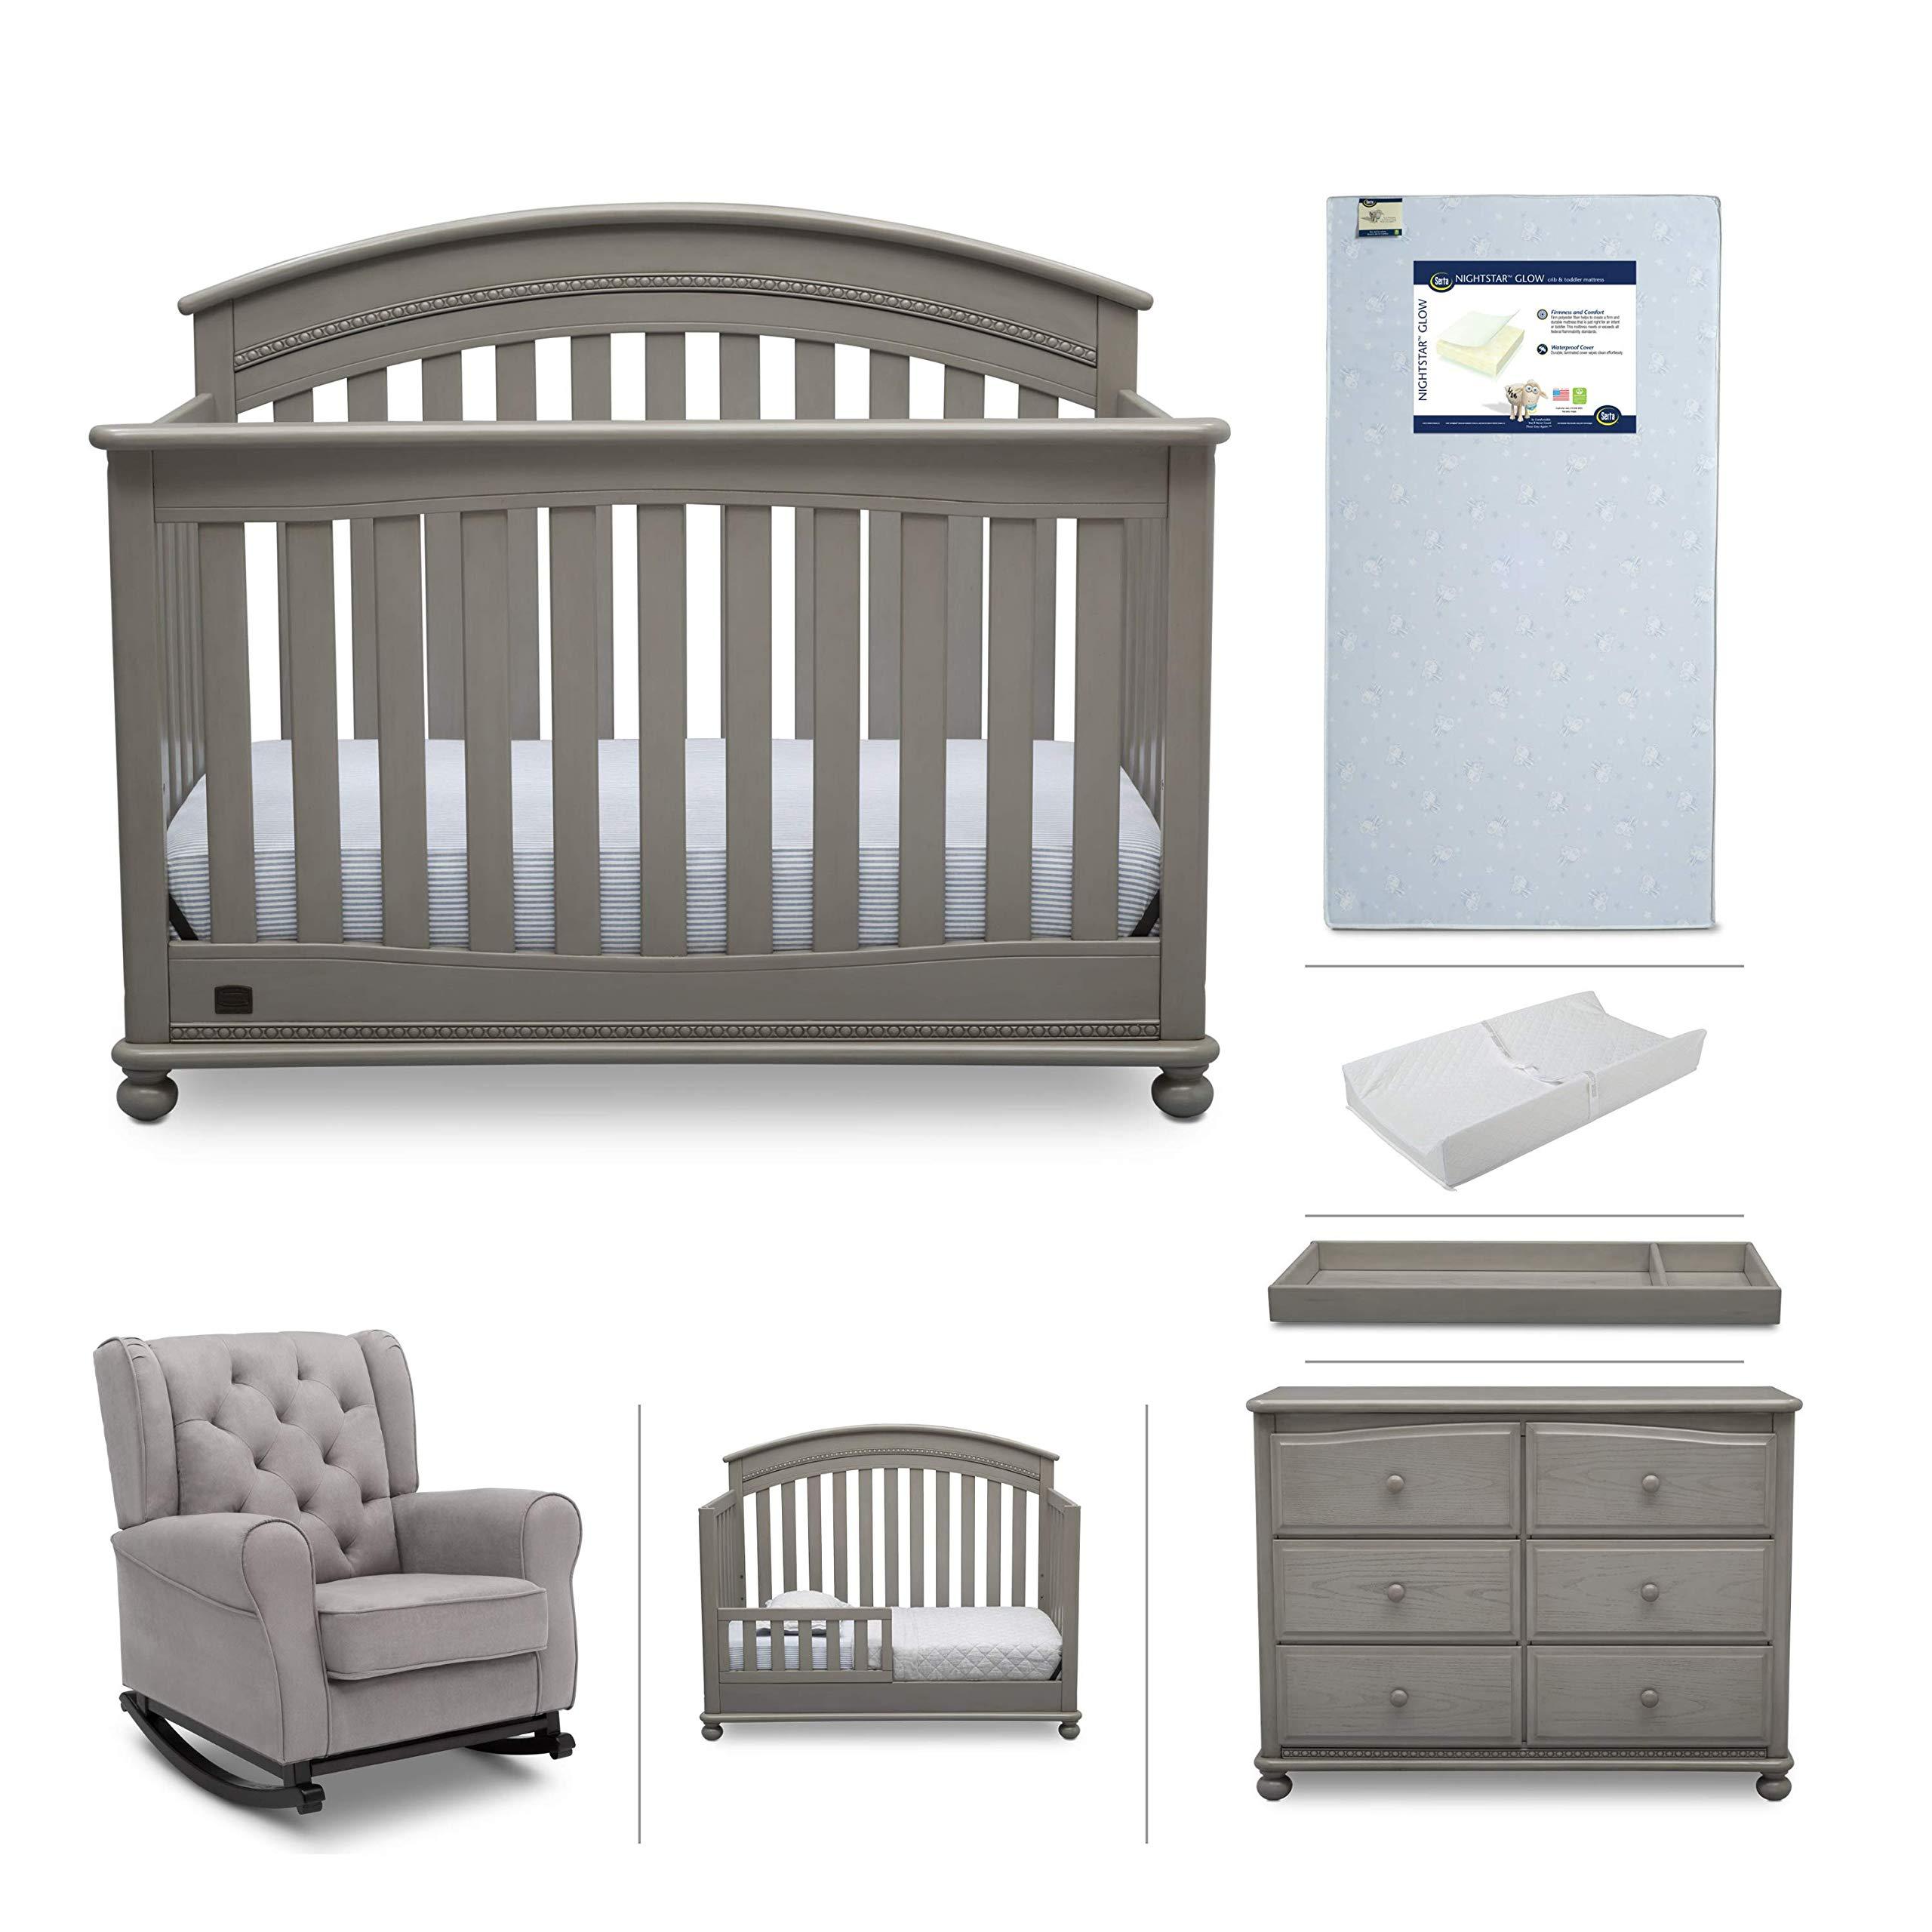 Baby Furniture Set - 7-Piece Simmons Kids Nursery, Aden | Convertible Crib, Dresser, Rocking Chair, Crib Mattress, Toddler Rail, Changing Top, Changing Pad, Grey/Storm Grey by Delta Children